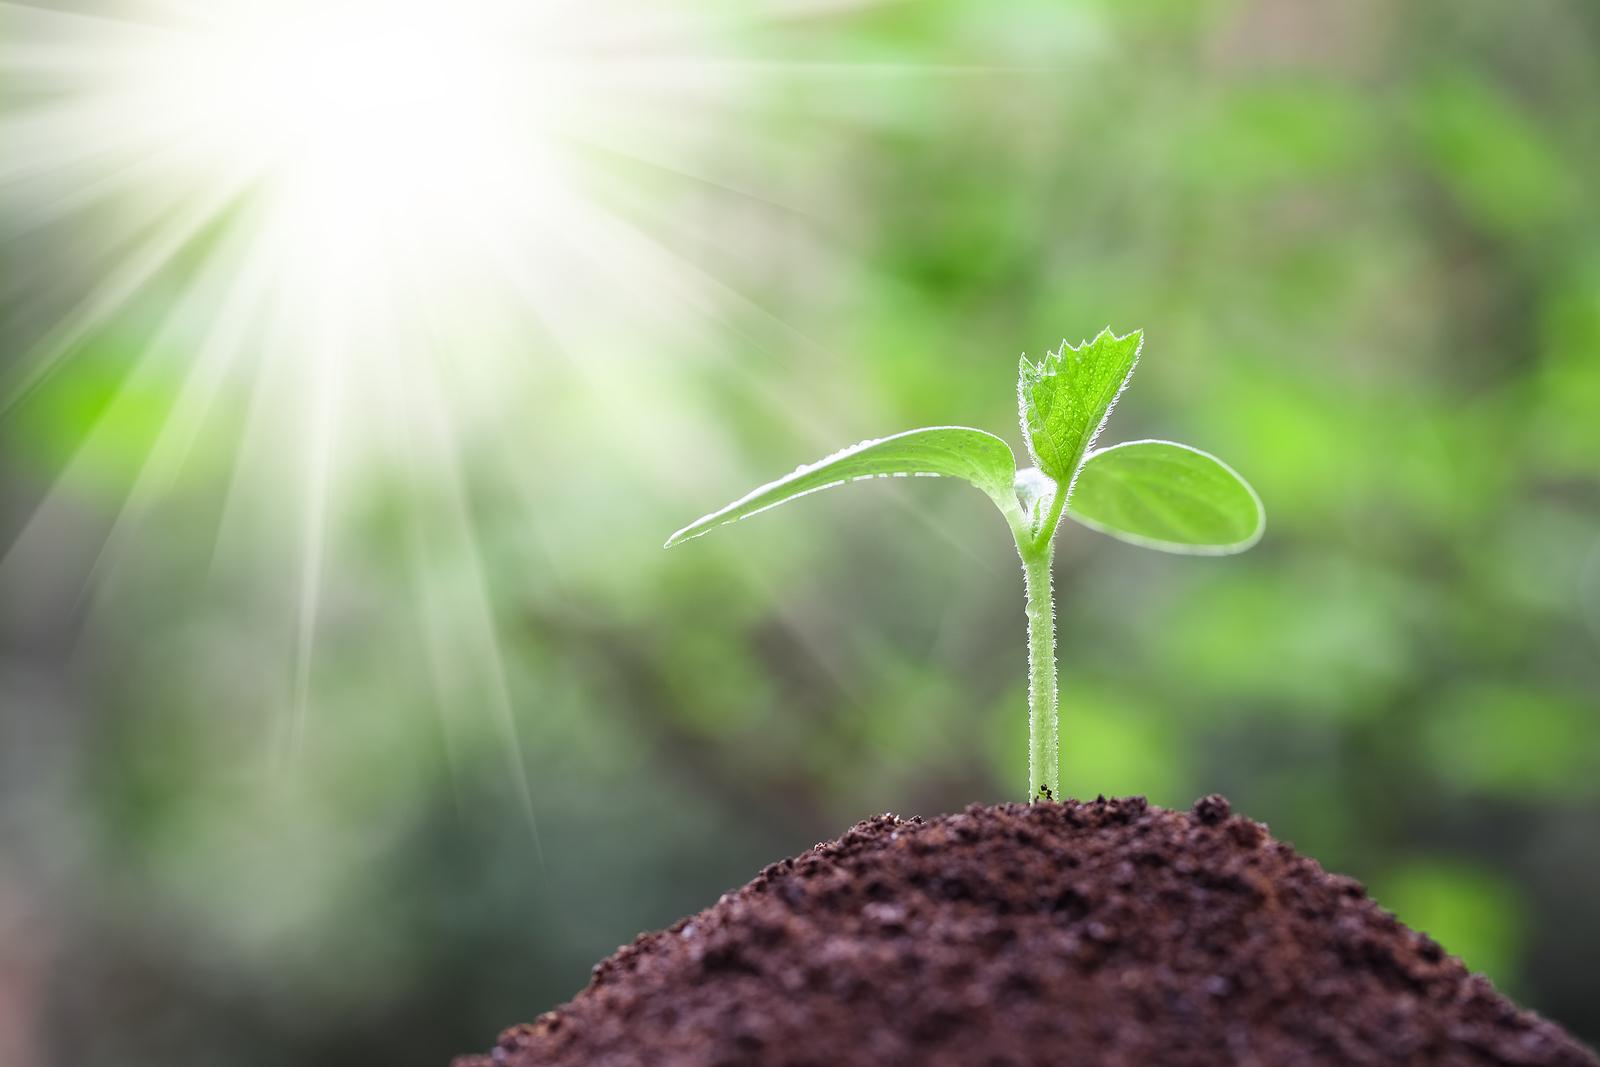 bigstock-Seedling-Closeup-With-Sunshine-64028794.jpg